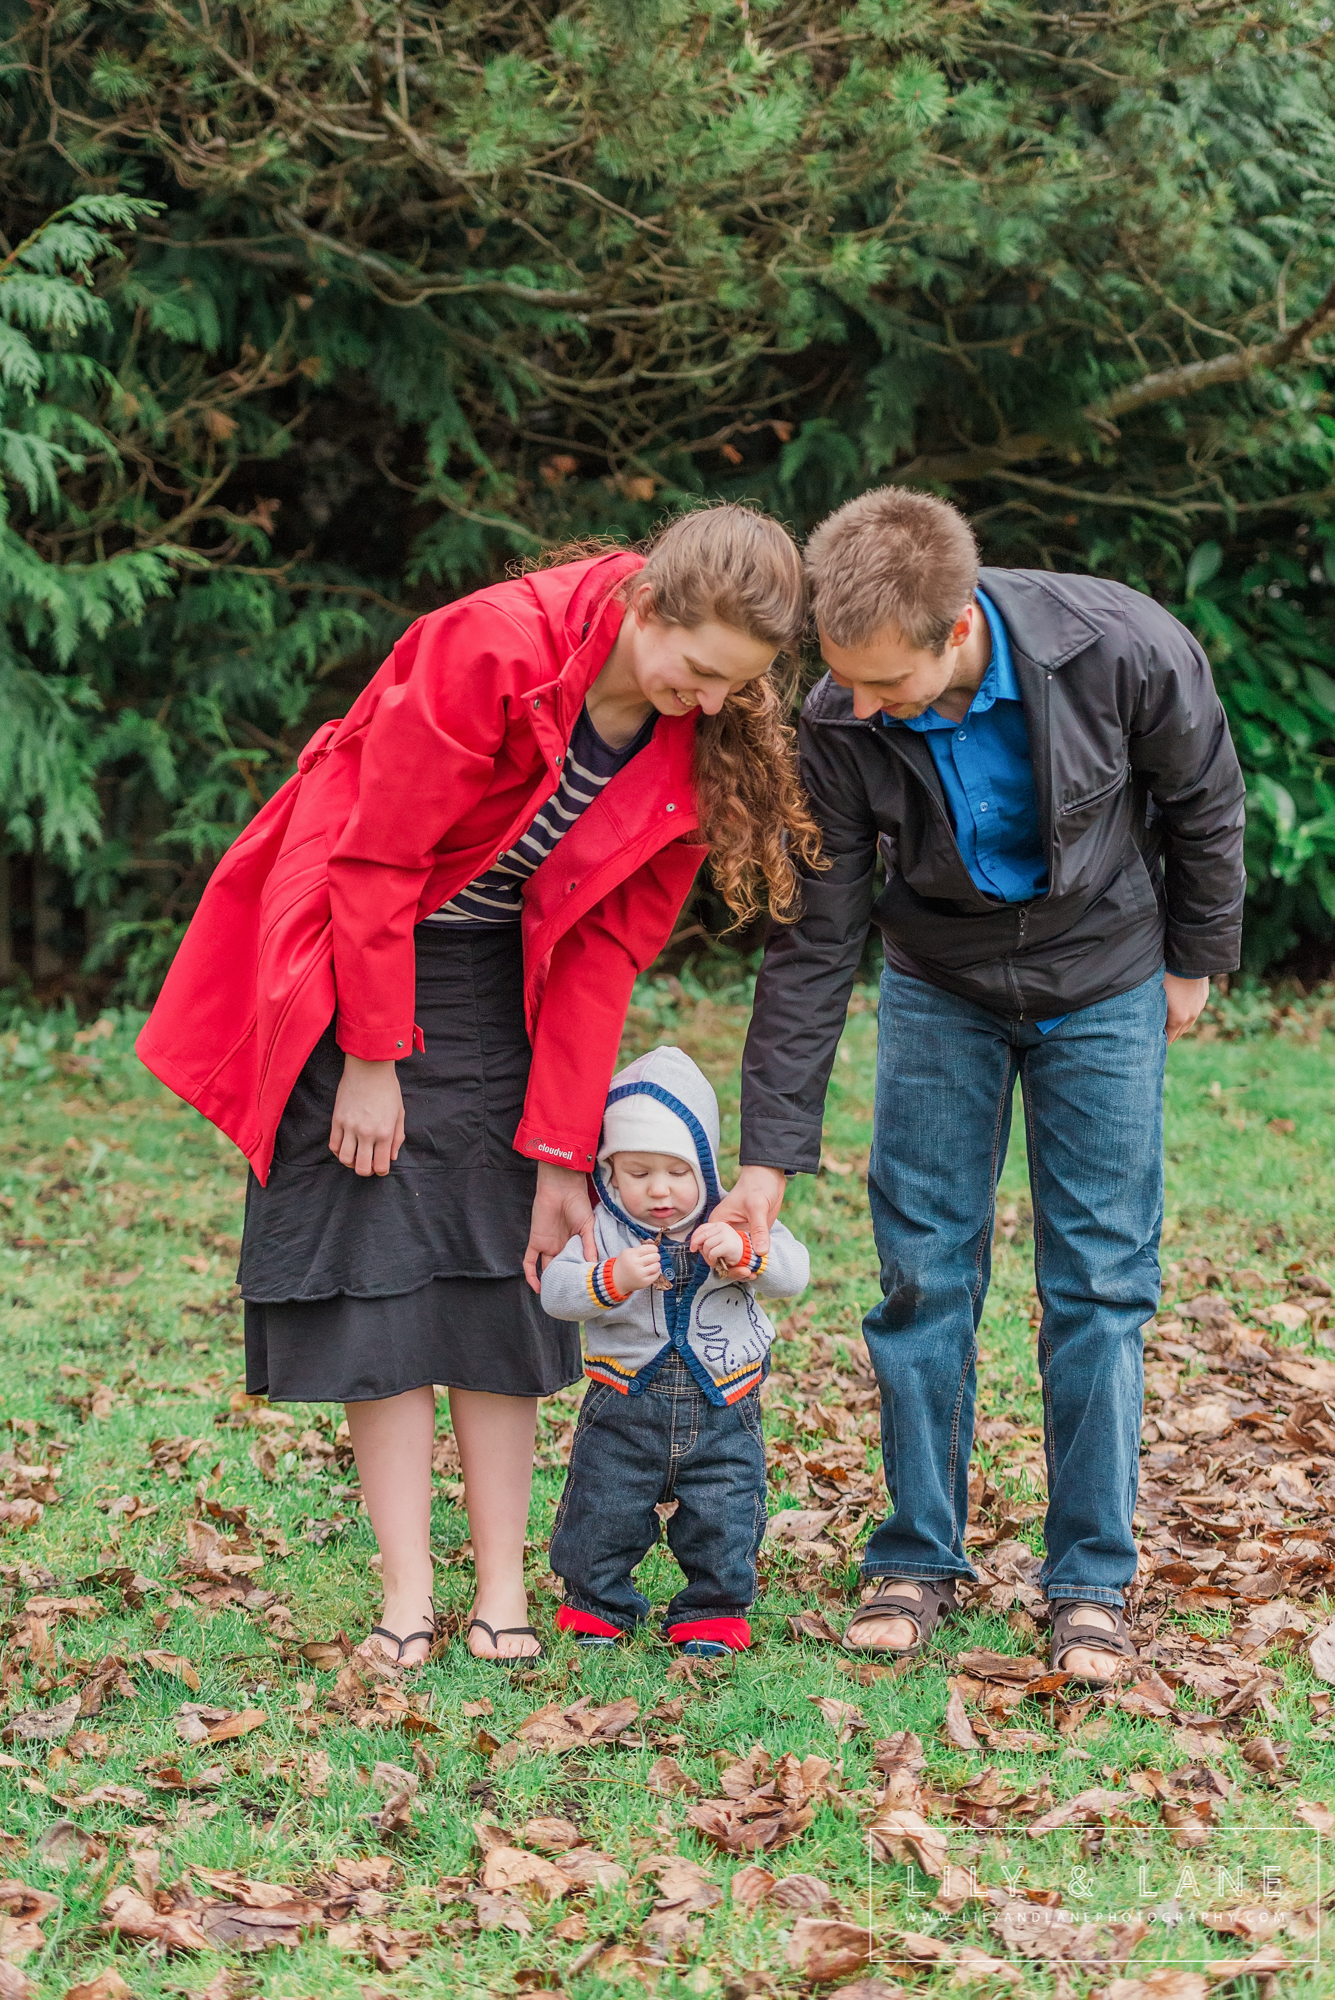 LilyandLane_VictoriaBC_ChildrensPhotography (21).jpg